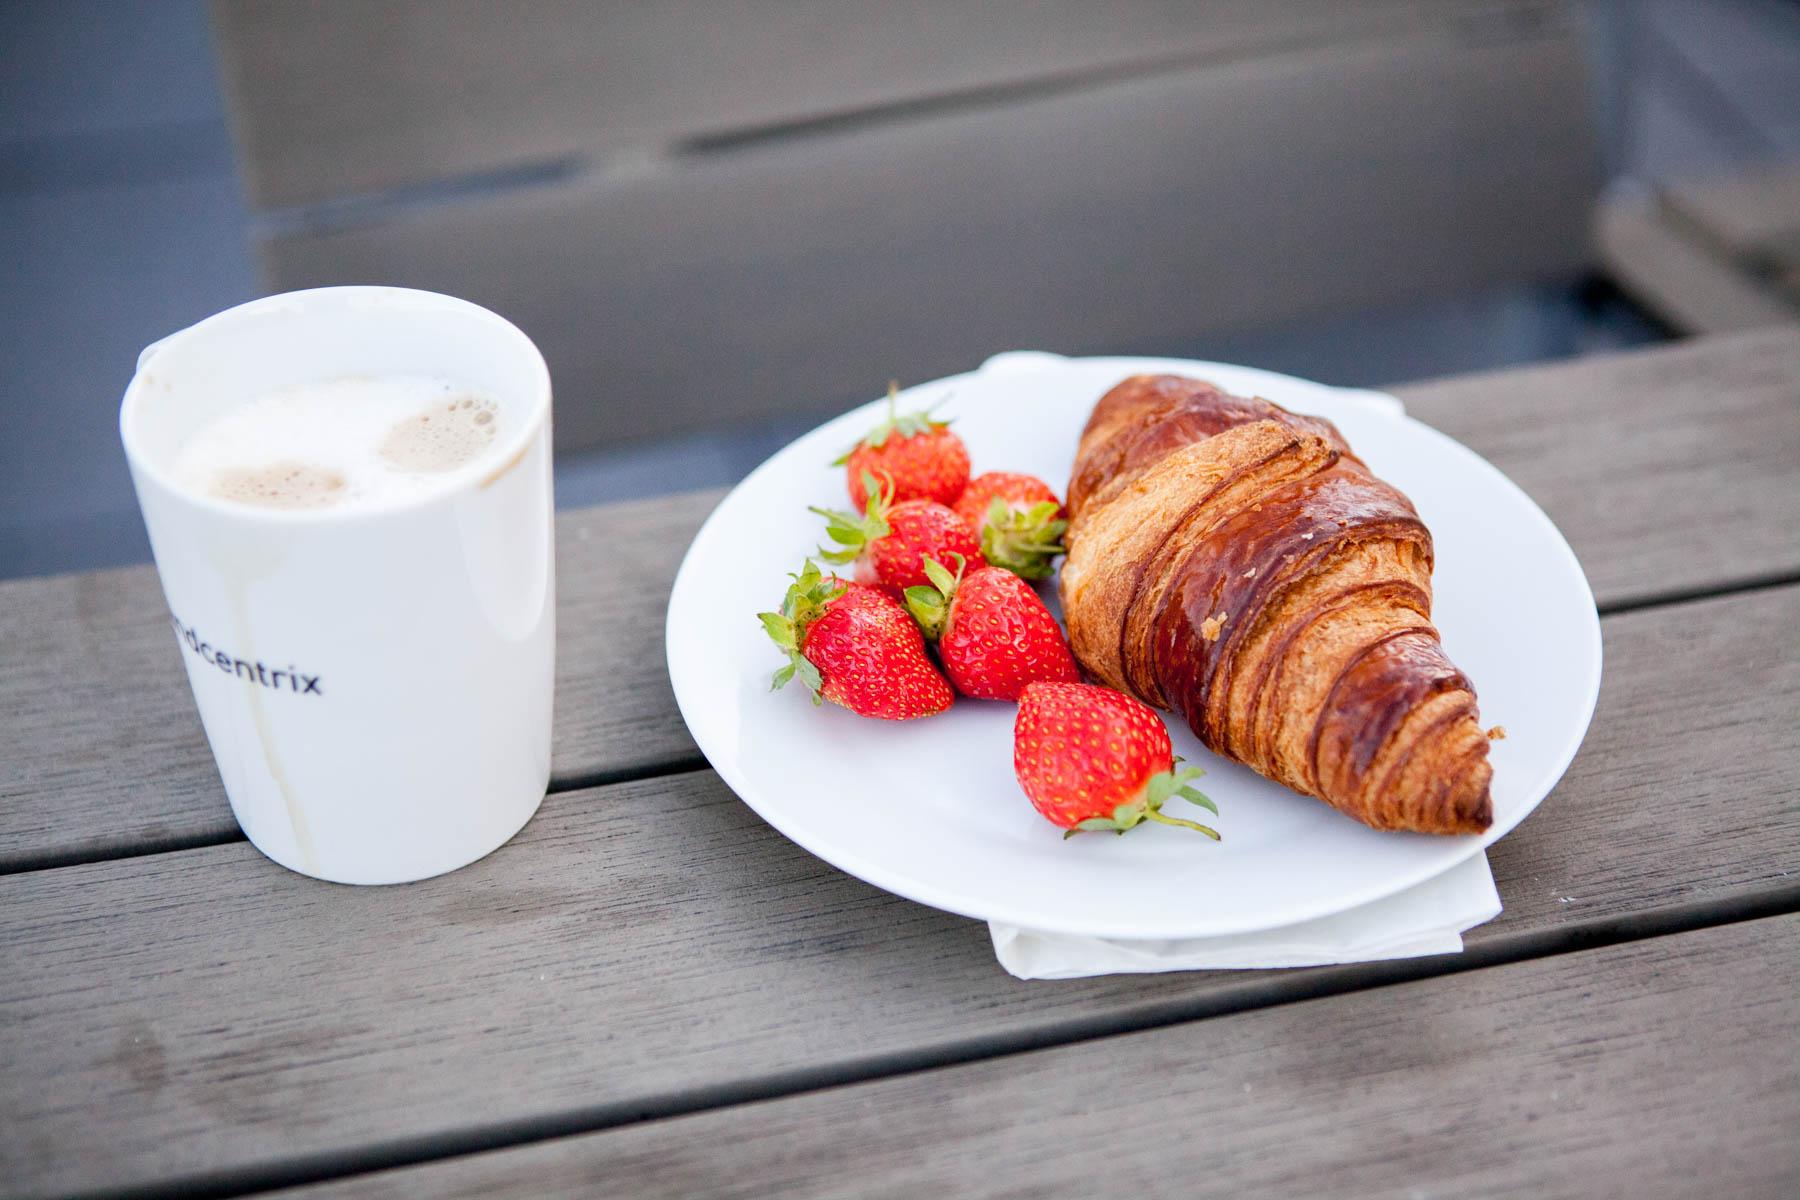 creative mornings köln vortrag frühstück grandceantrix Michaela Berghaus Veronica Garcia kaffee erdbeeren croissant jörn strojny